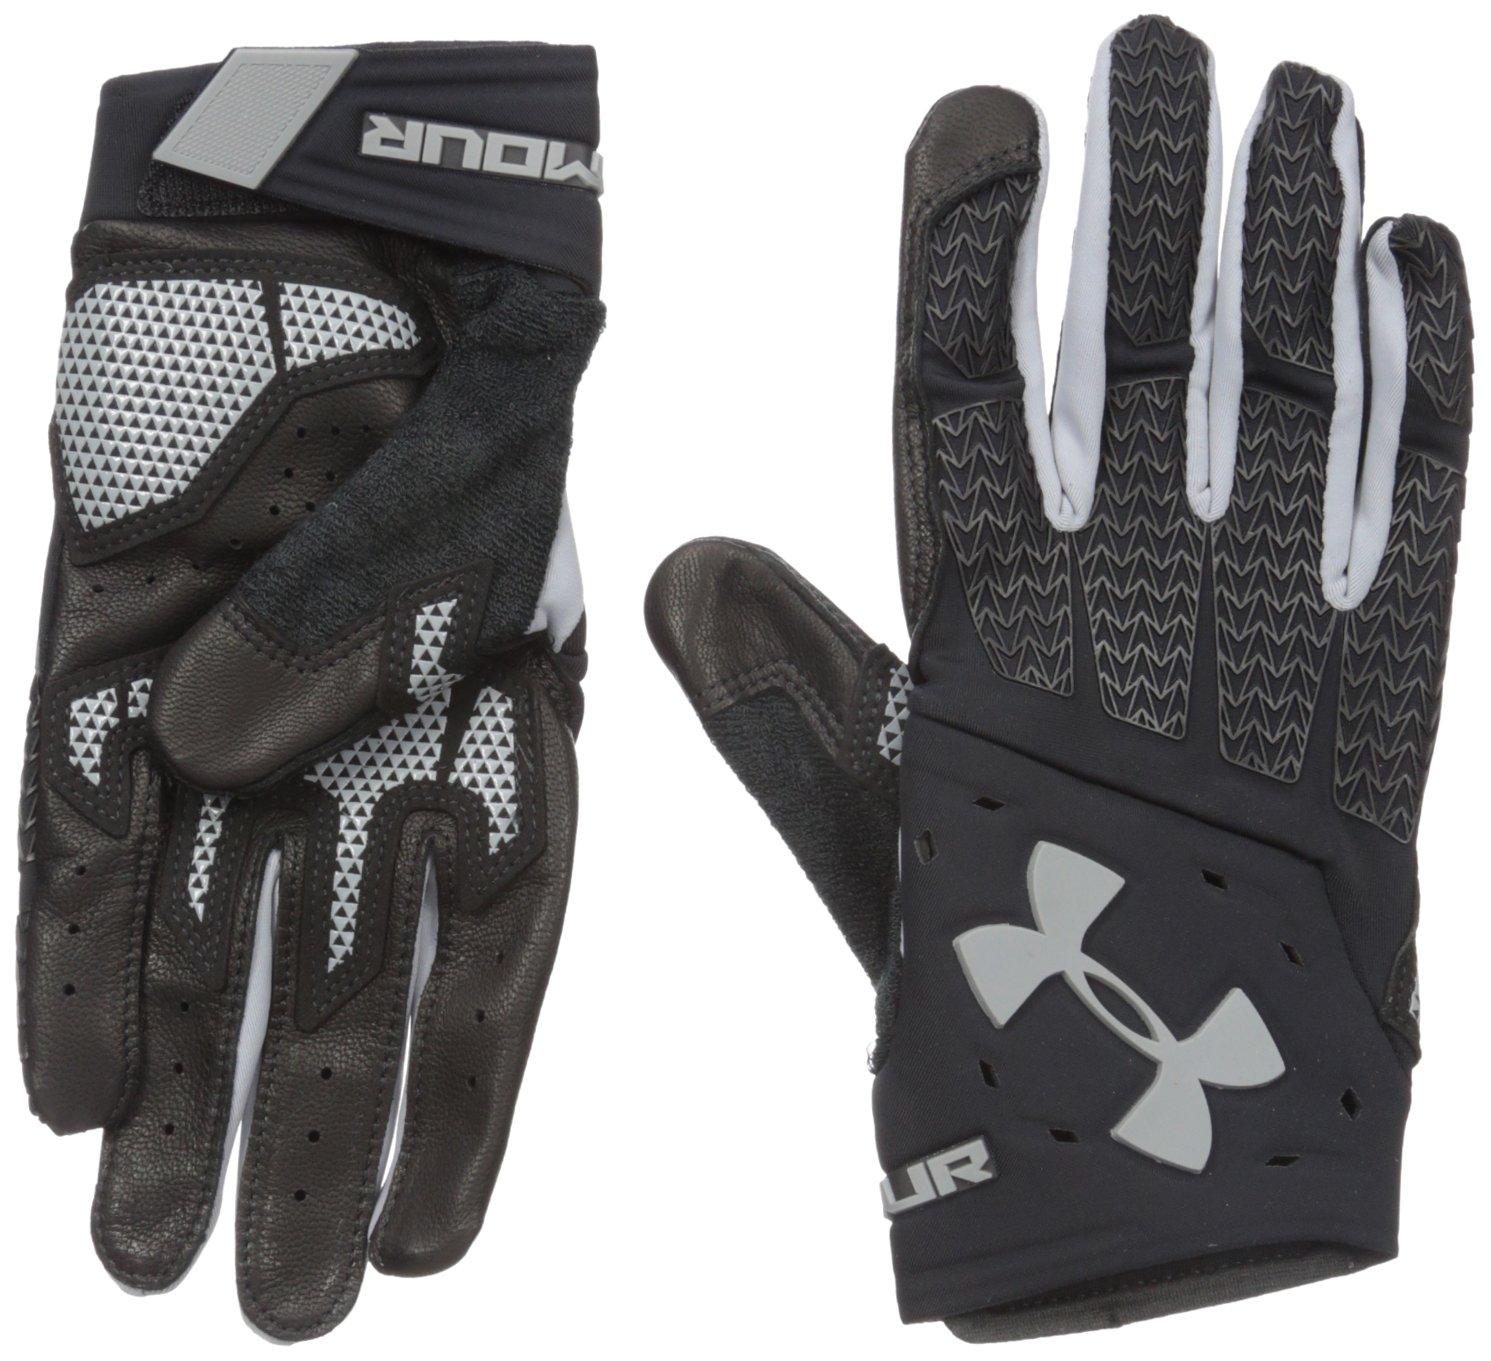 Under ArmourメンズCLUTCHFIT Renegadeトレーニング手袋 B01M30631U XX-Large ブラック/ブラック ブラック/ブラック XX-Large